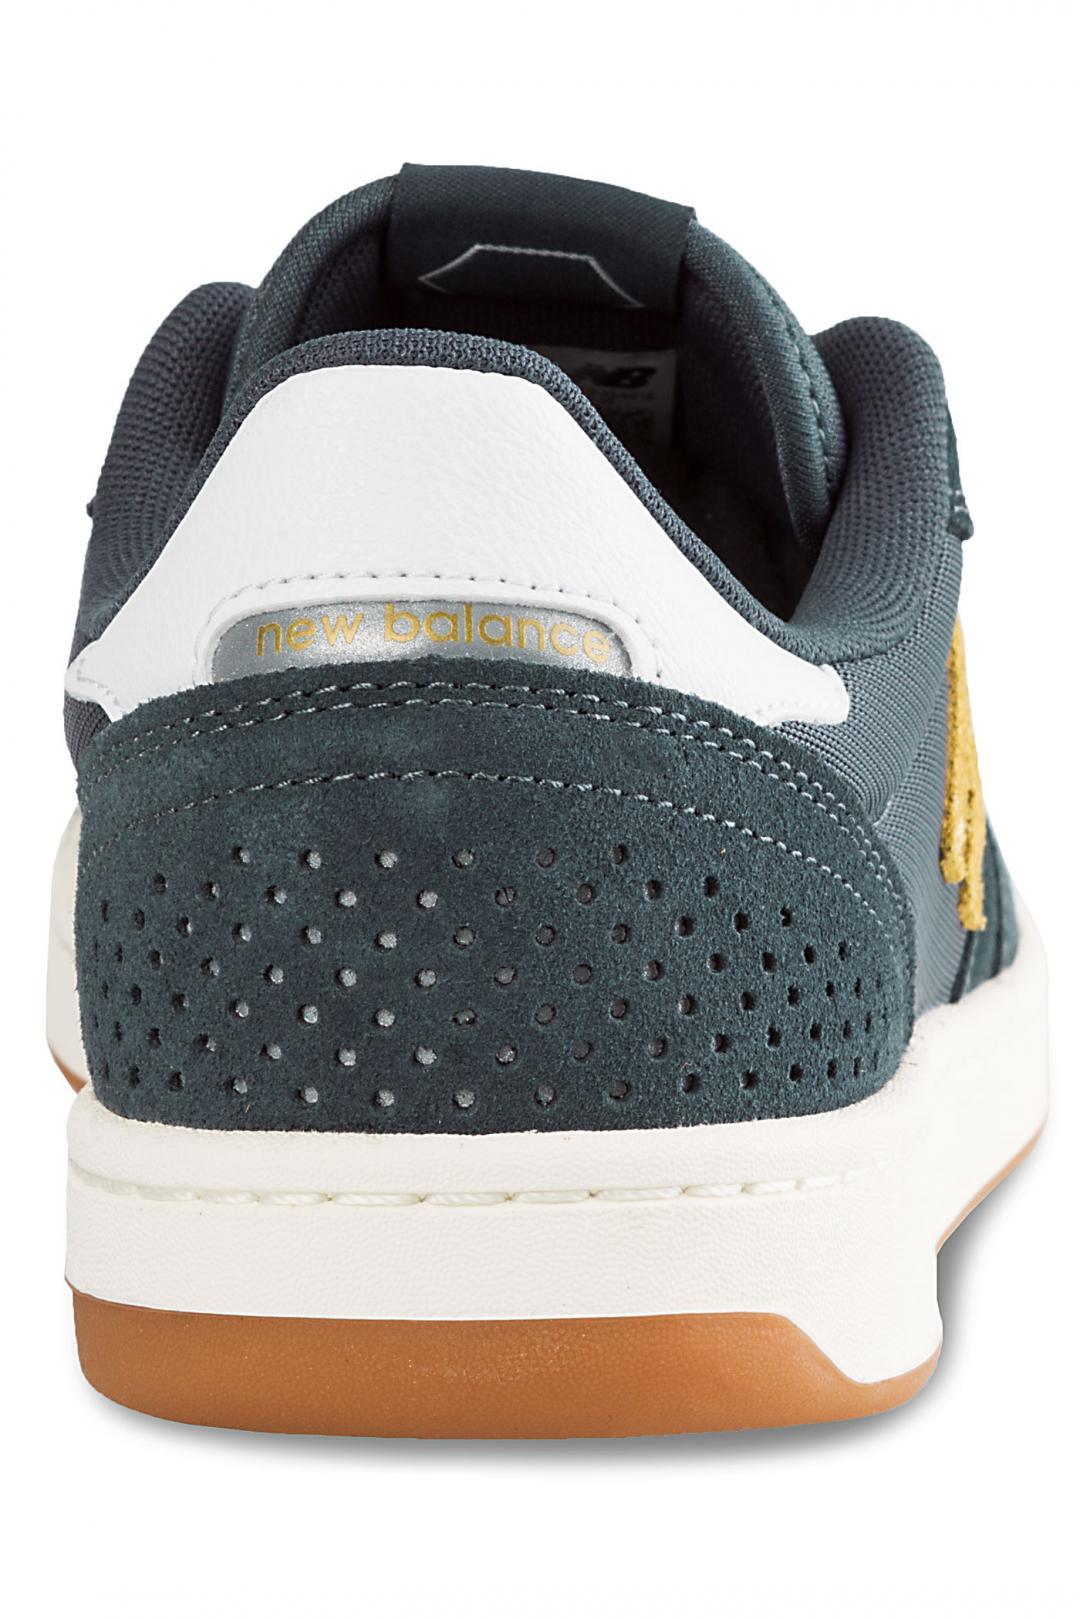 Uomo New Balance Numeric 440 grey white | Sneaker